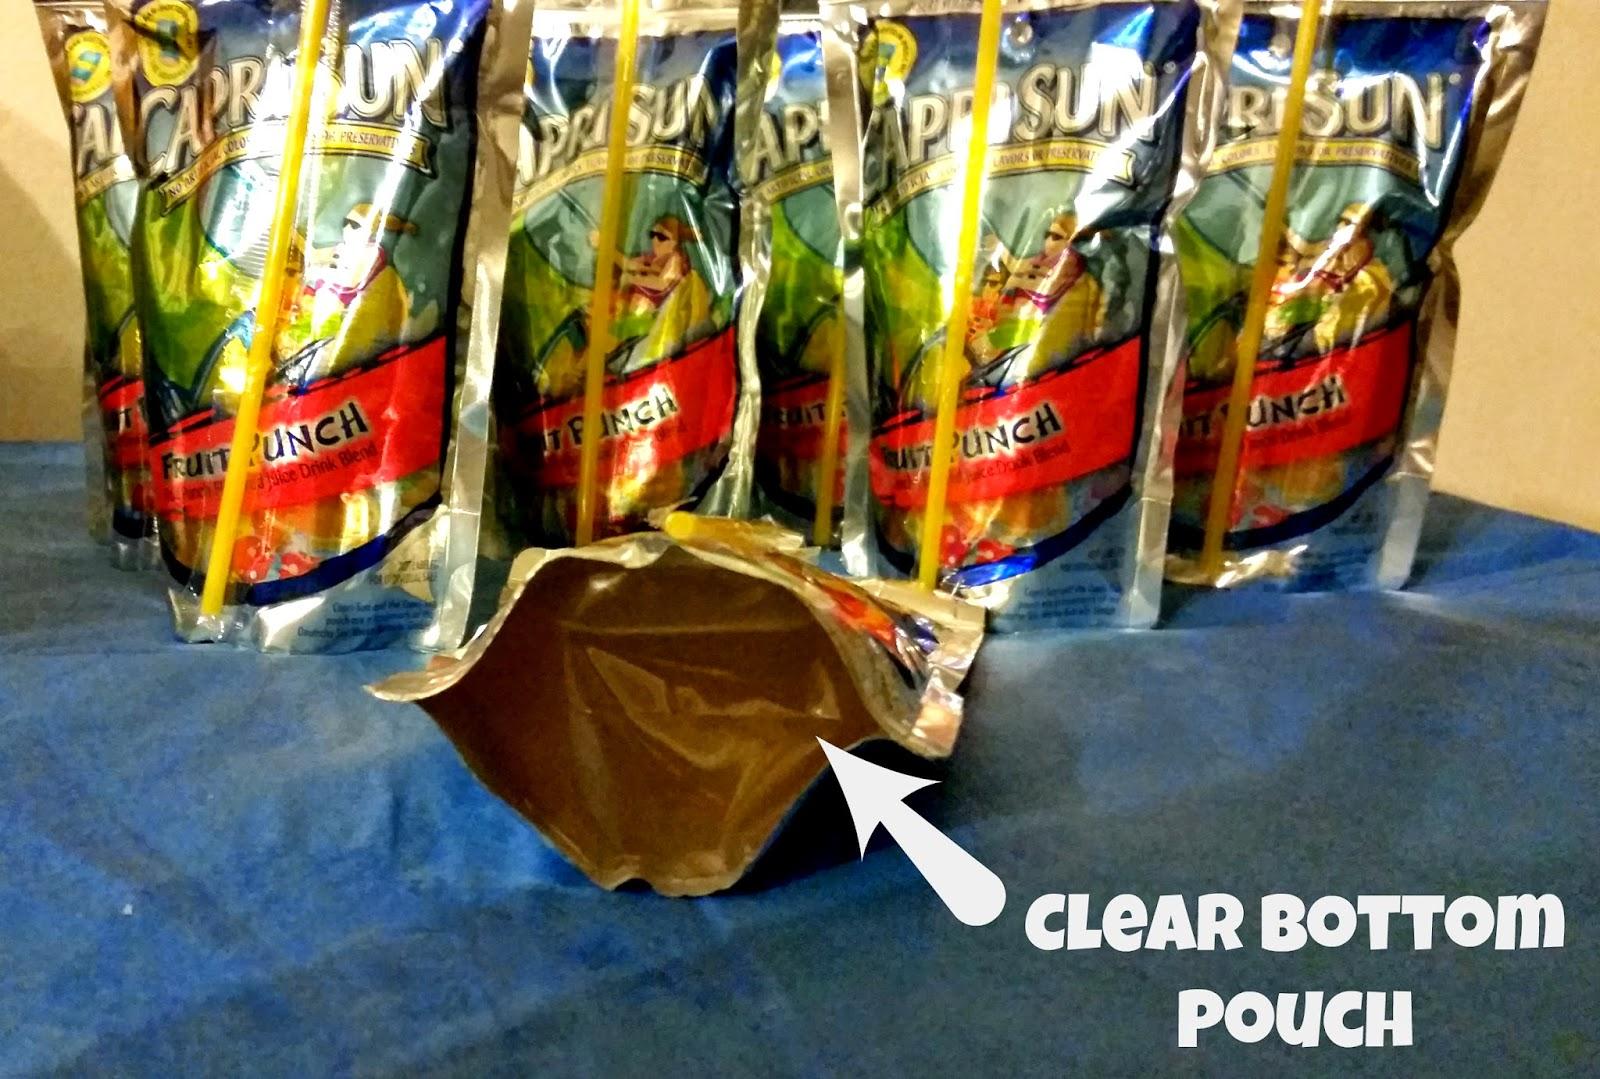 Capri Sun new clear bottom pouch #GolazoKraft #shop